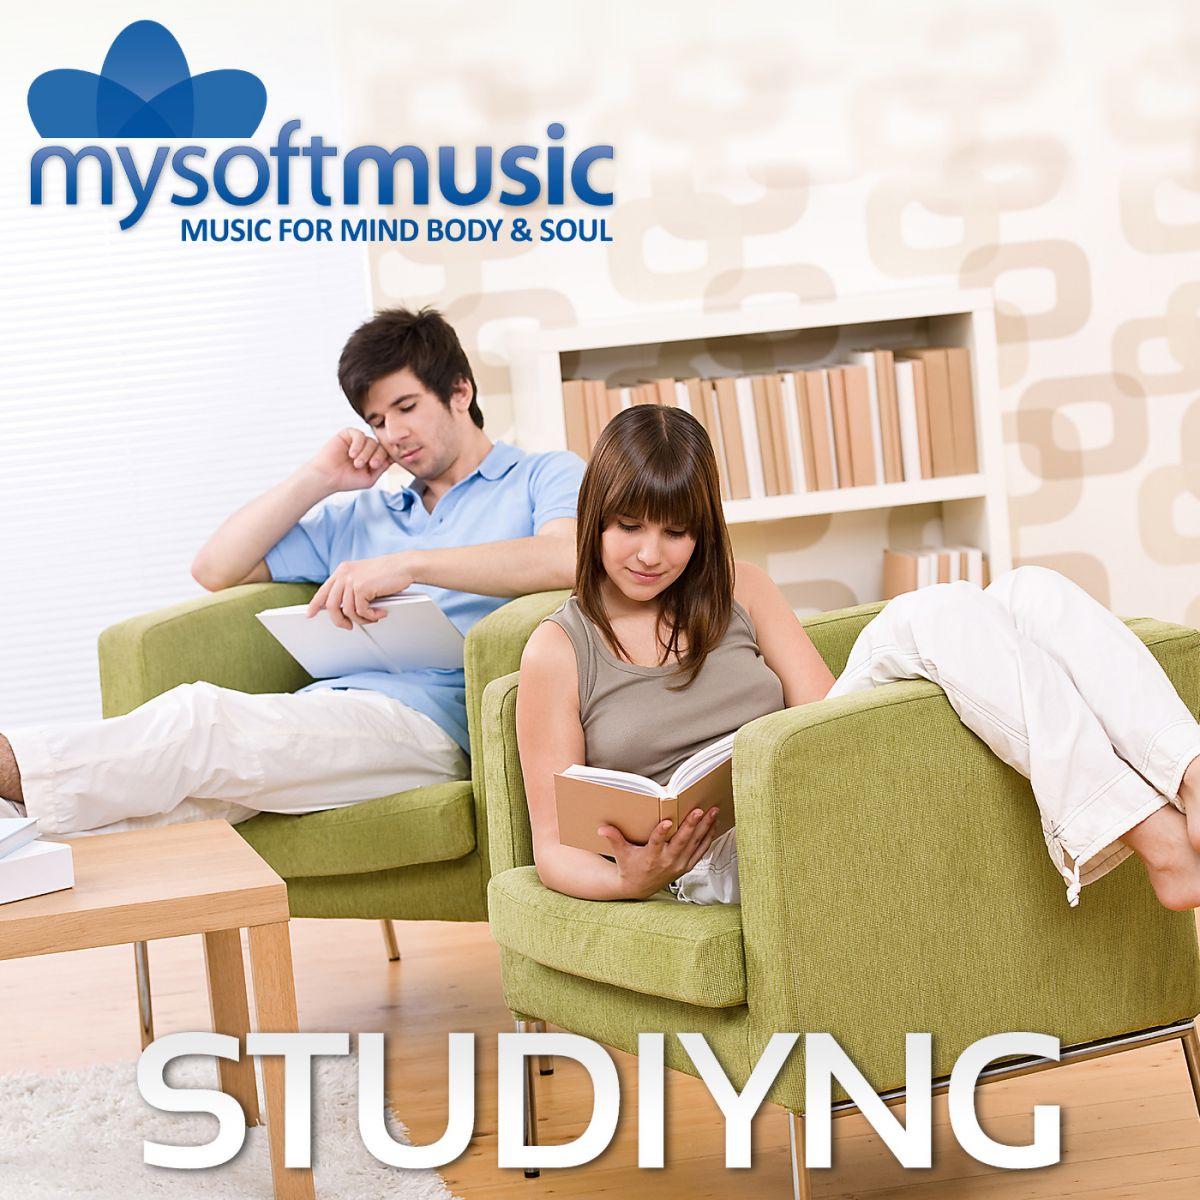 Studying music mp3 | Kirk Monteux mysoftmusic